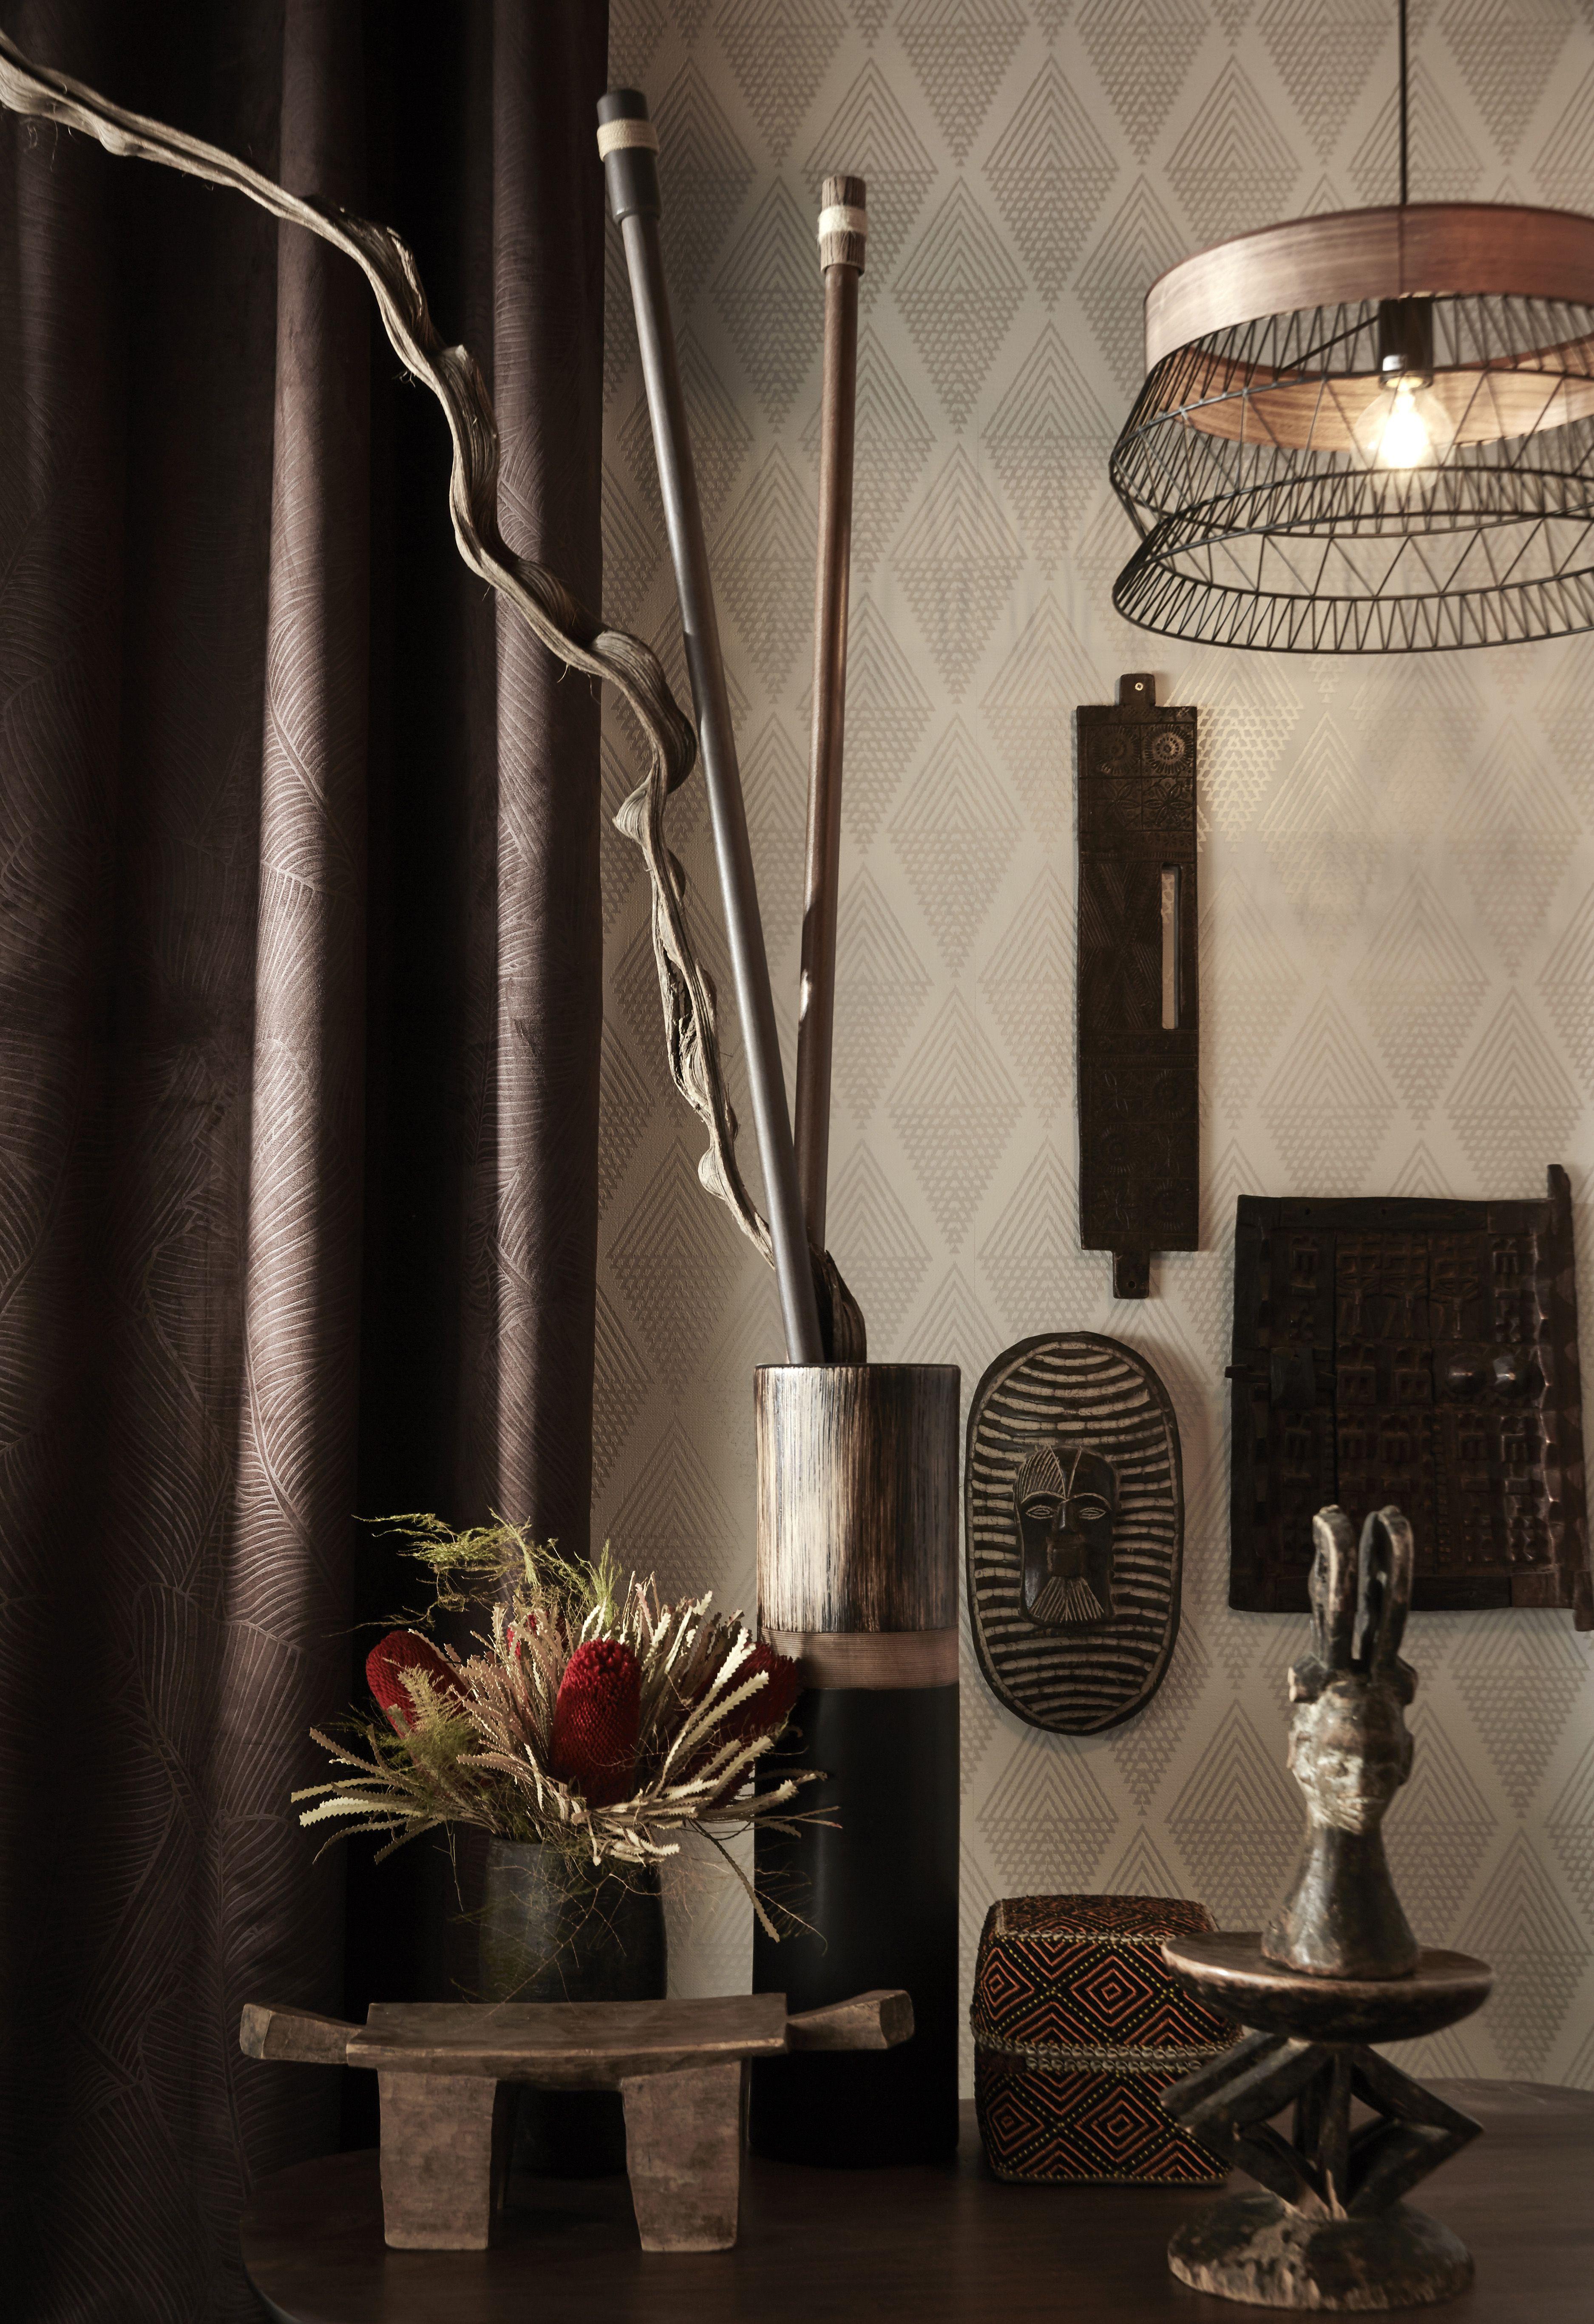 cool la suspension design manam mtal noir reflte bien la. Black Bedroom Furniture Sets. Home Design Ideas